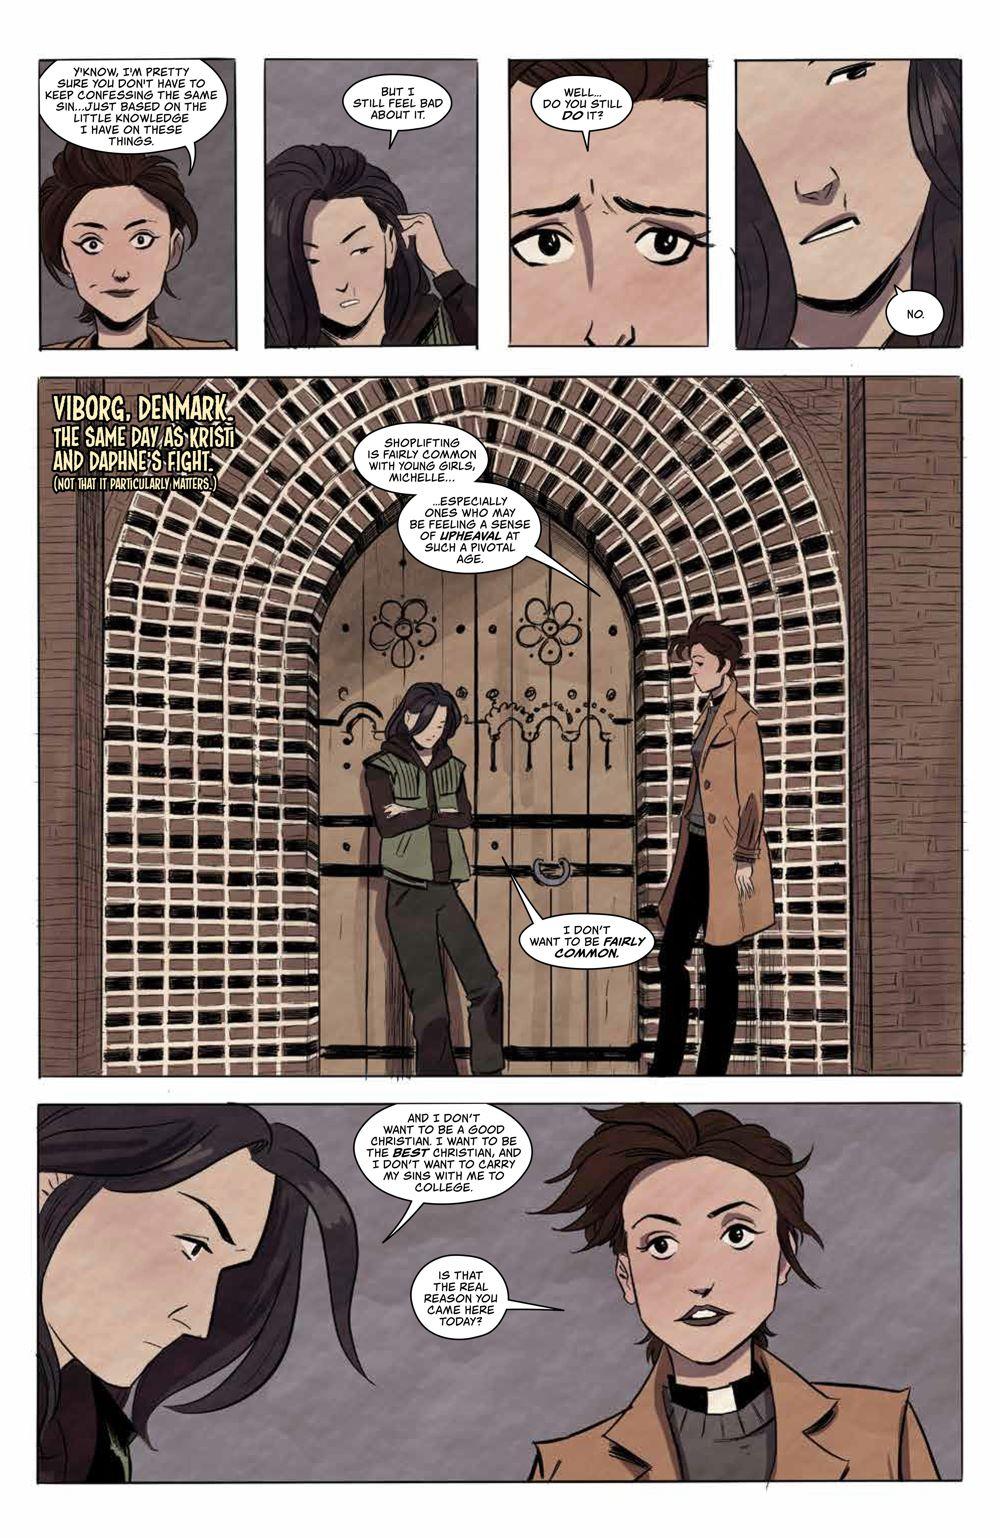 GhostedInLA_v3_SC_PRESS_9 ComicList Previews: GHOSTED IN L.A. VOLUME 3 TP